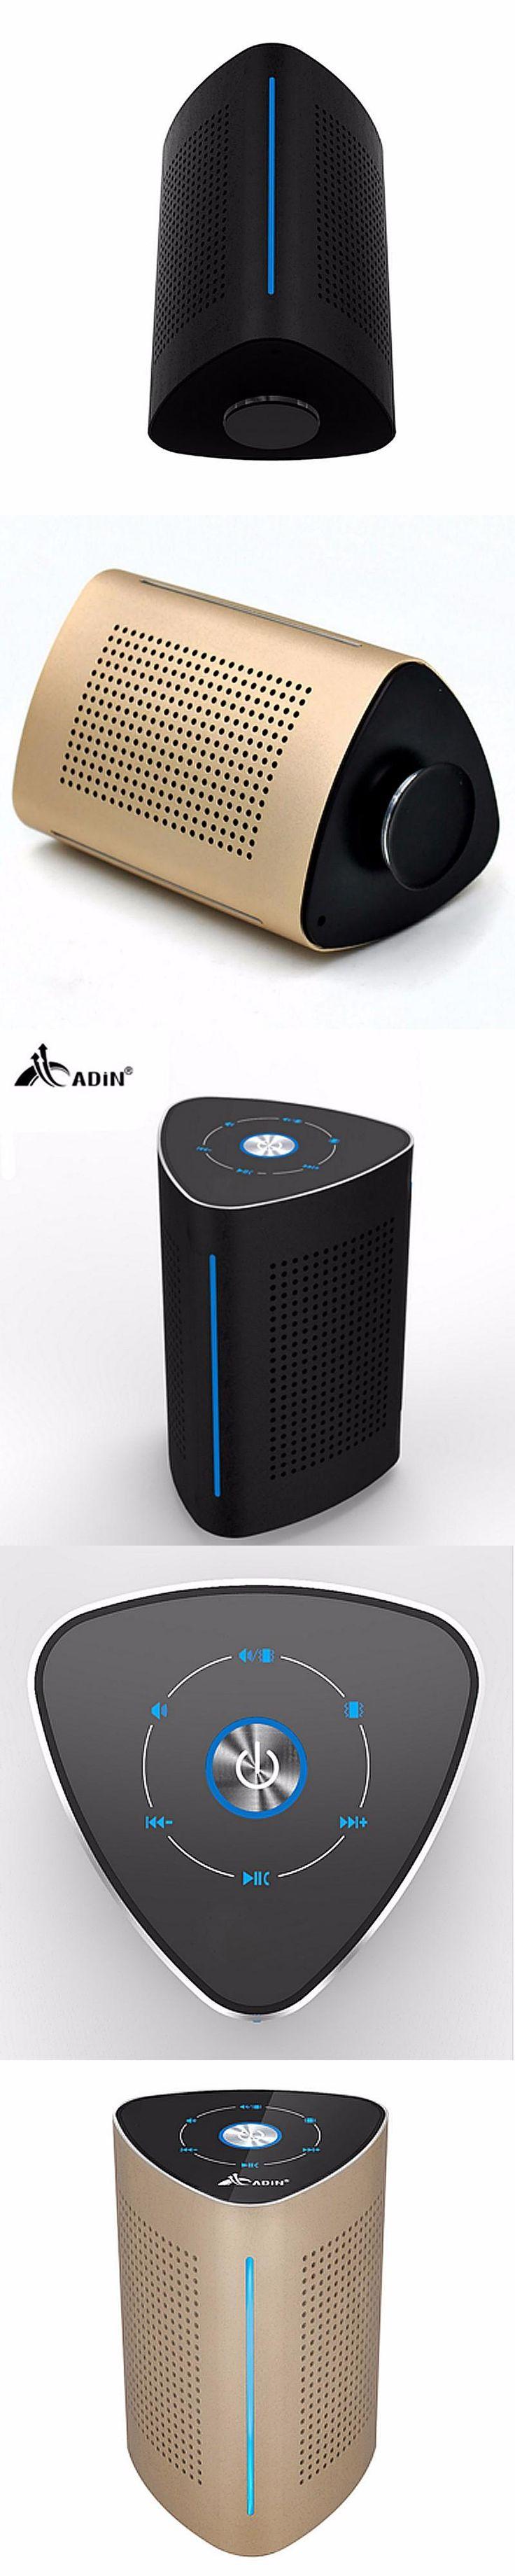 New Adin Wireless Bluetooth Speakers Resonance Speakerphone Stereo Speaker Outdoor Stereo Computer Audio With Microphone